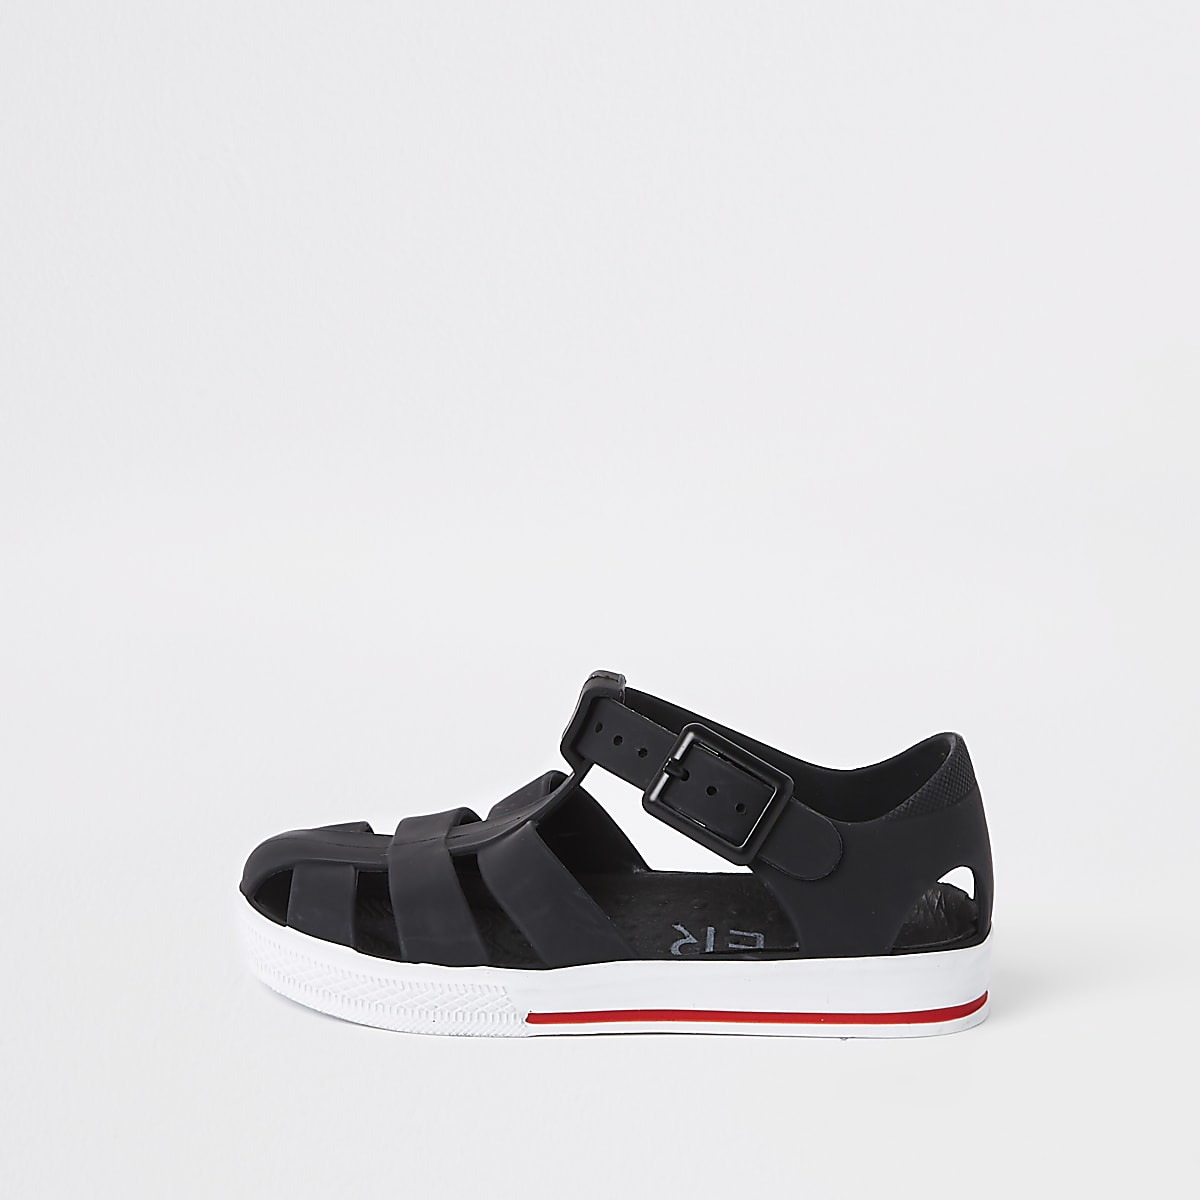 Mini - Zwarte jelly sandaletten voor jongens